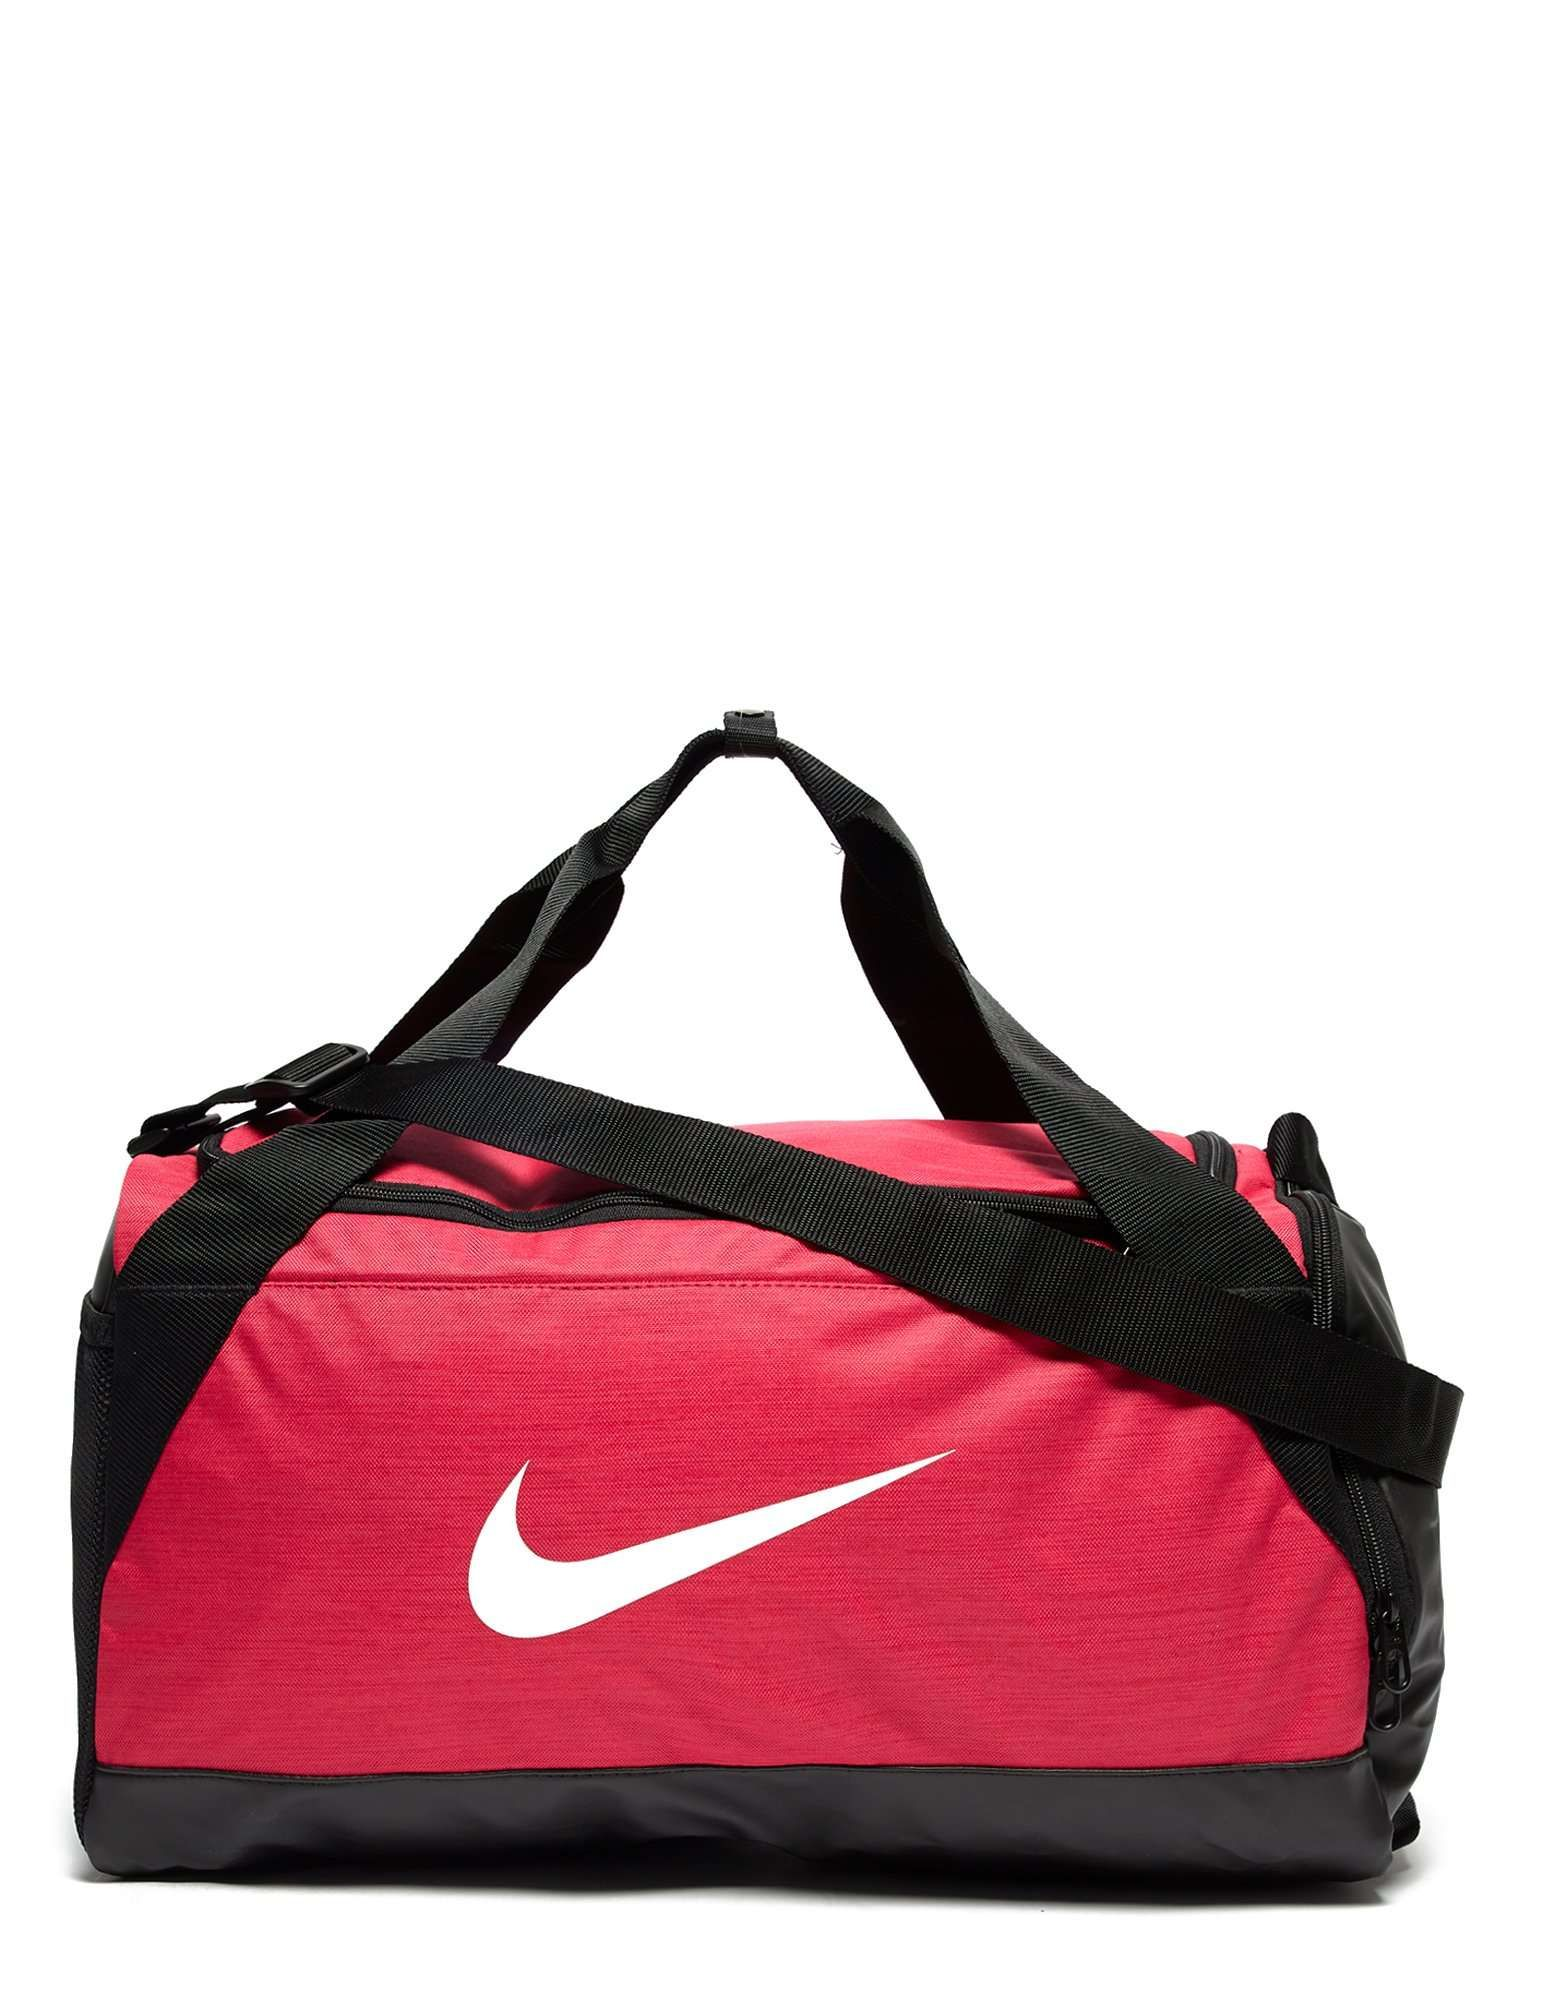 75615be38 Nike Brasilia Small Duffle Bag - Shop online for Nike Brasilia Small Duffle  Bag with JD